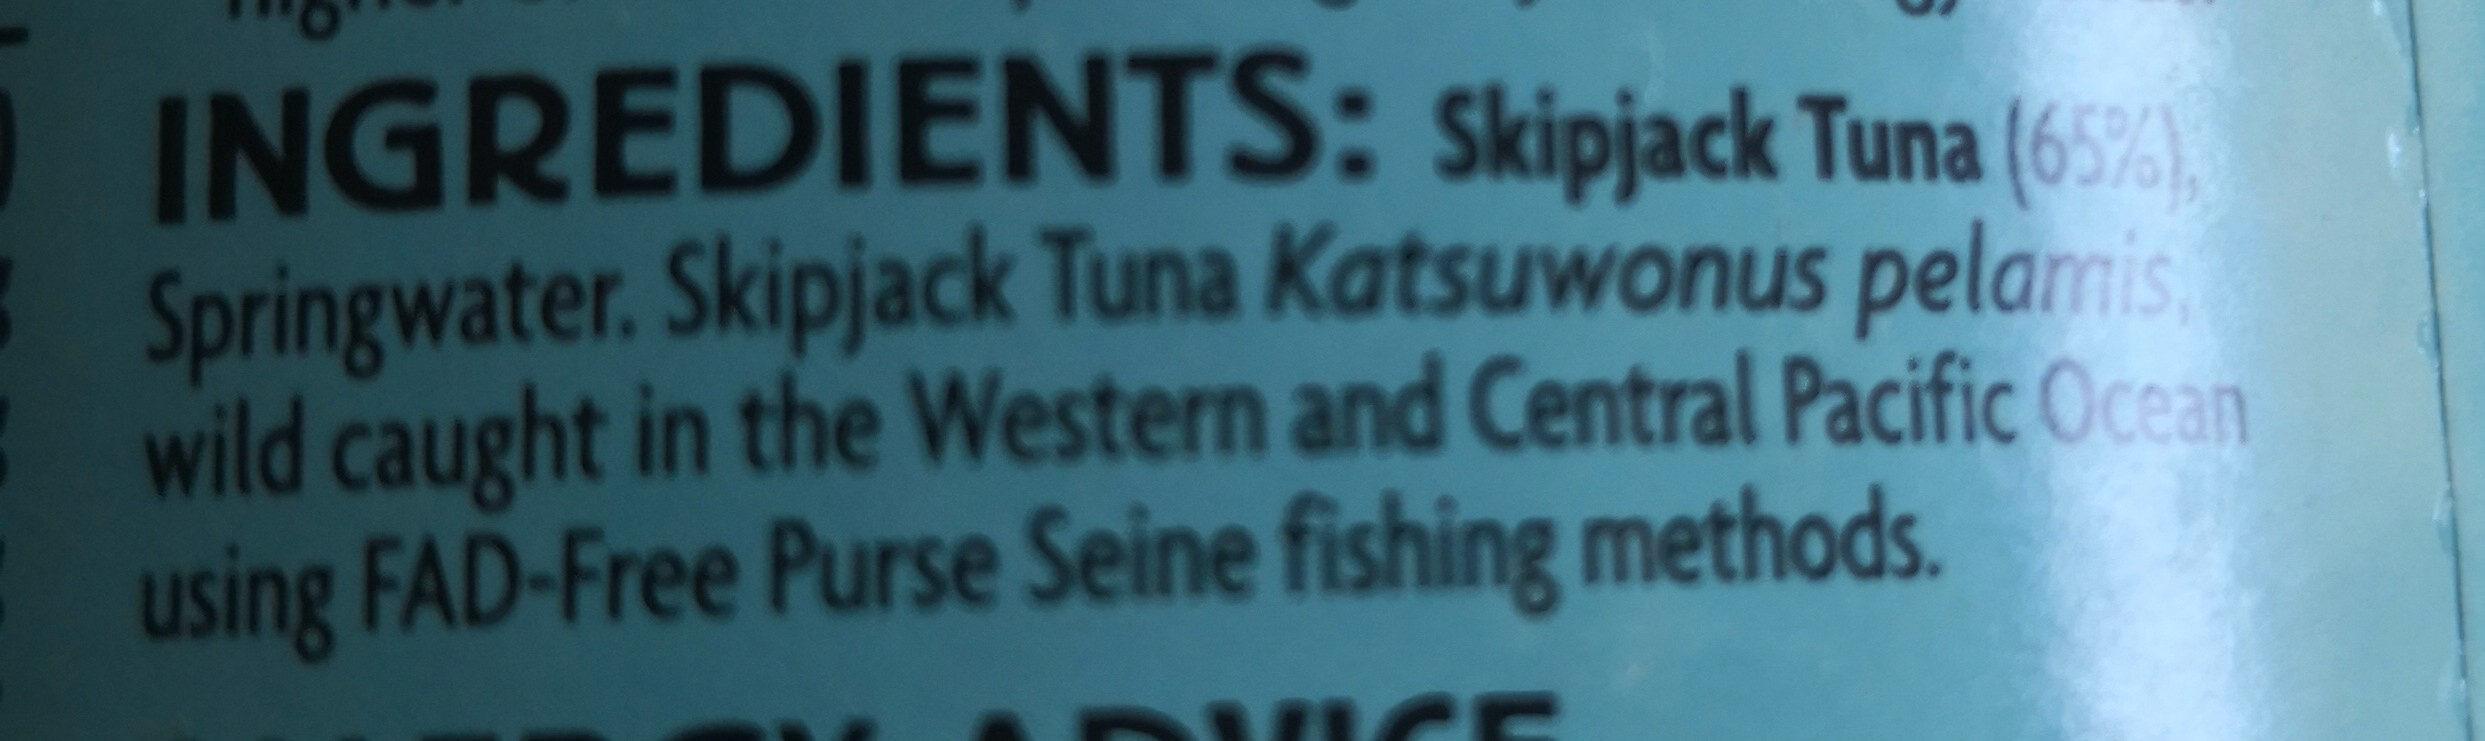 tuna in springwater - Ingredients